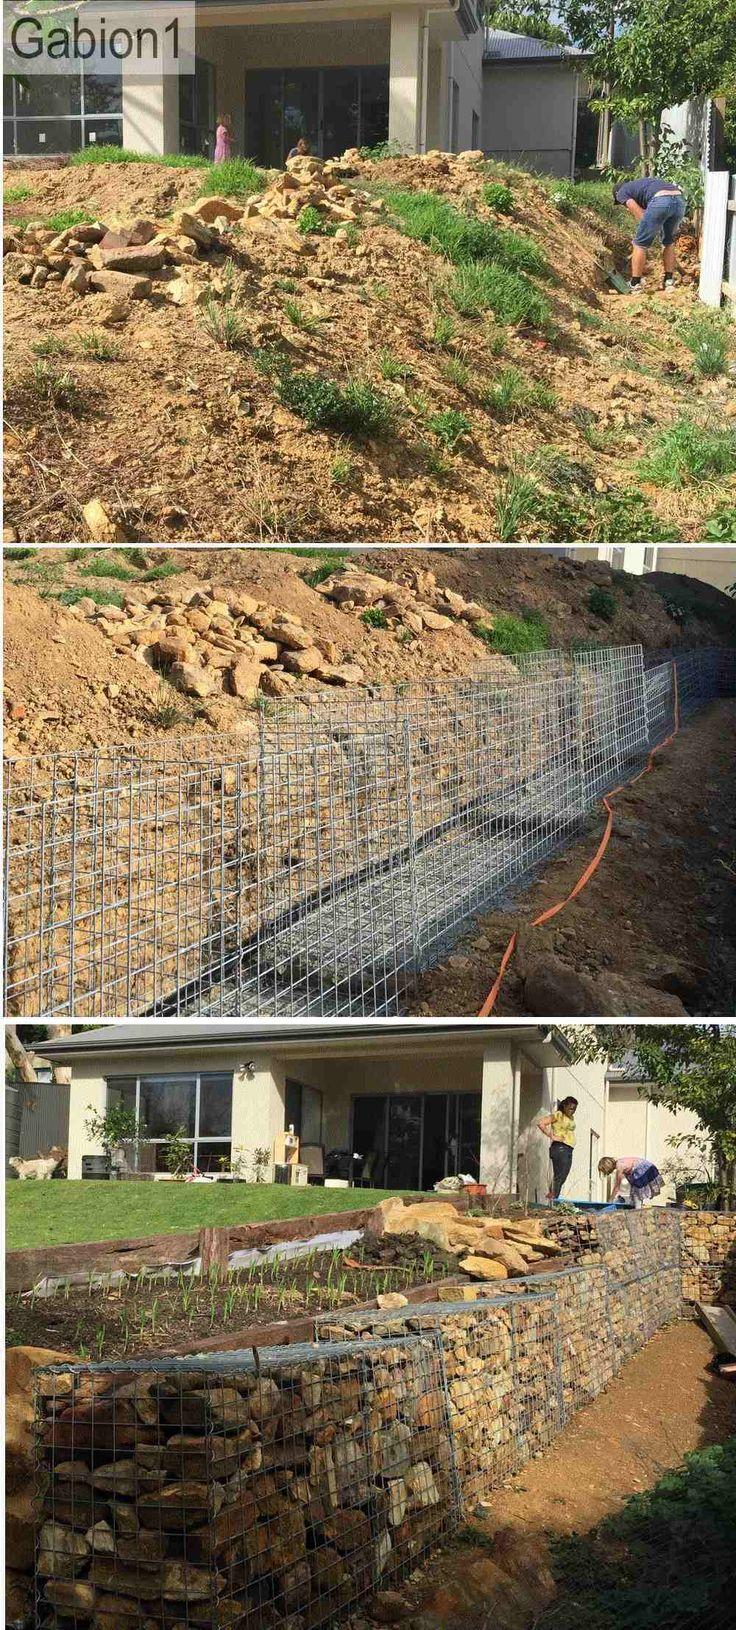 gabion retaining wall construction http www gabion1 com on construction of walls id=83448